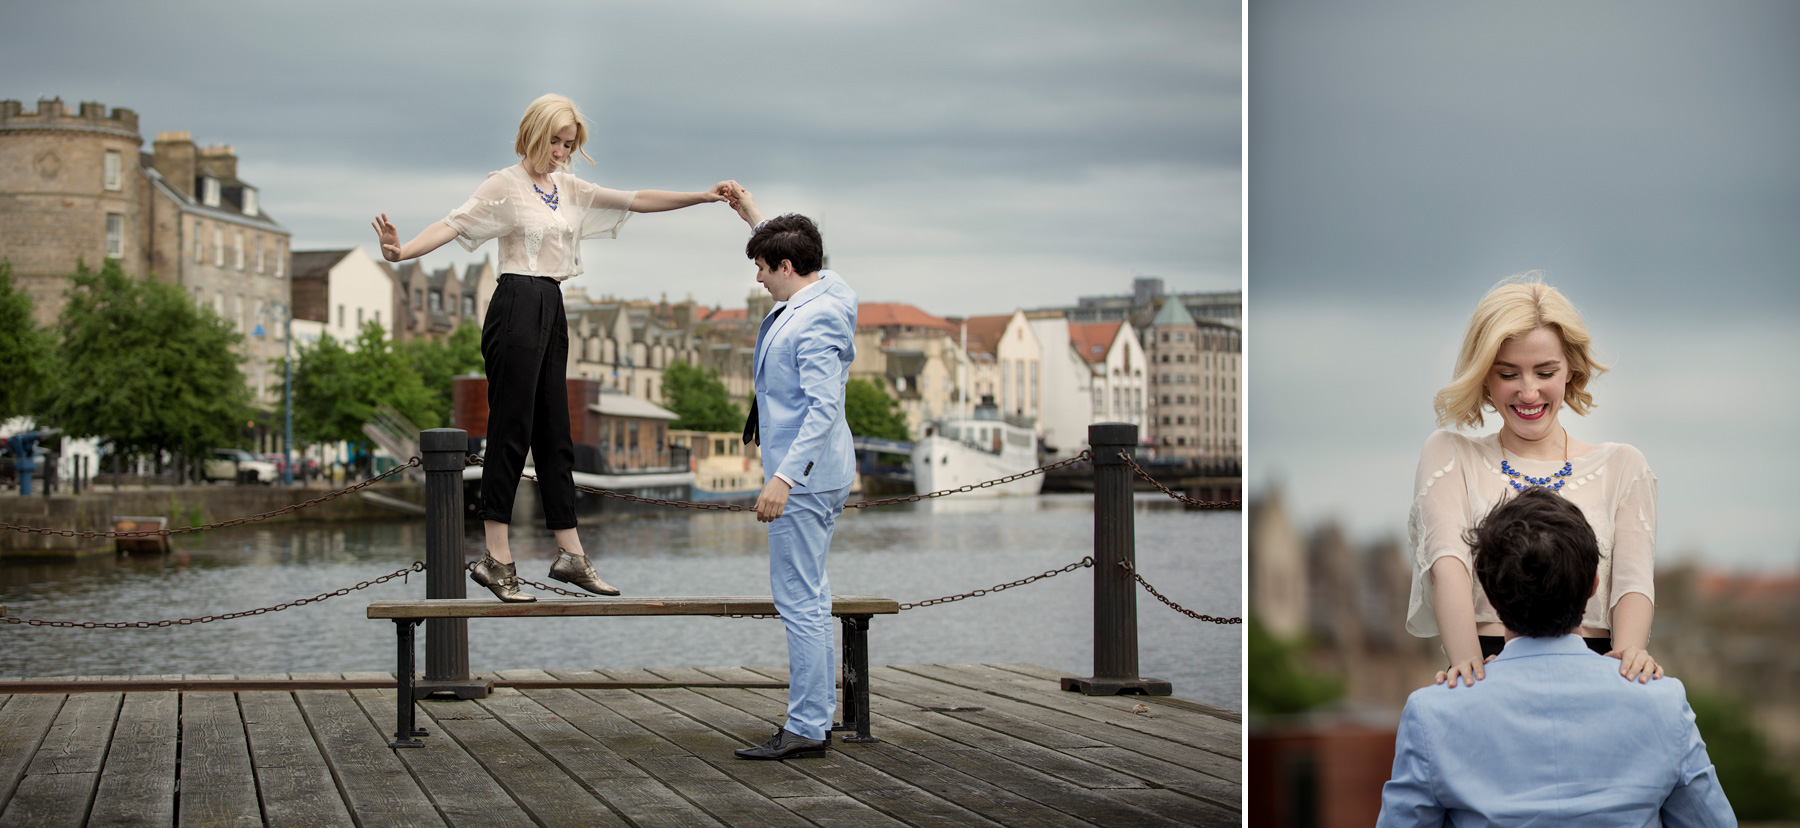 Leith Docks couple